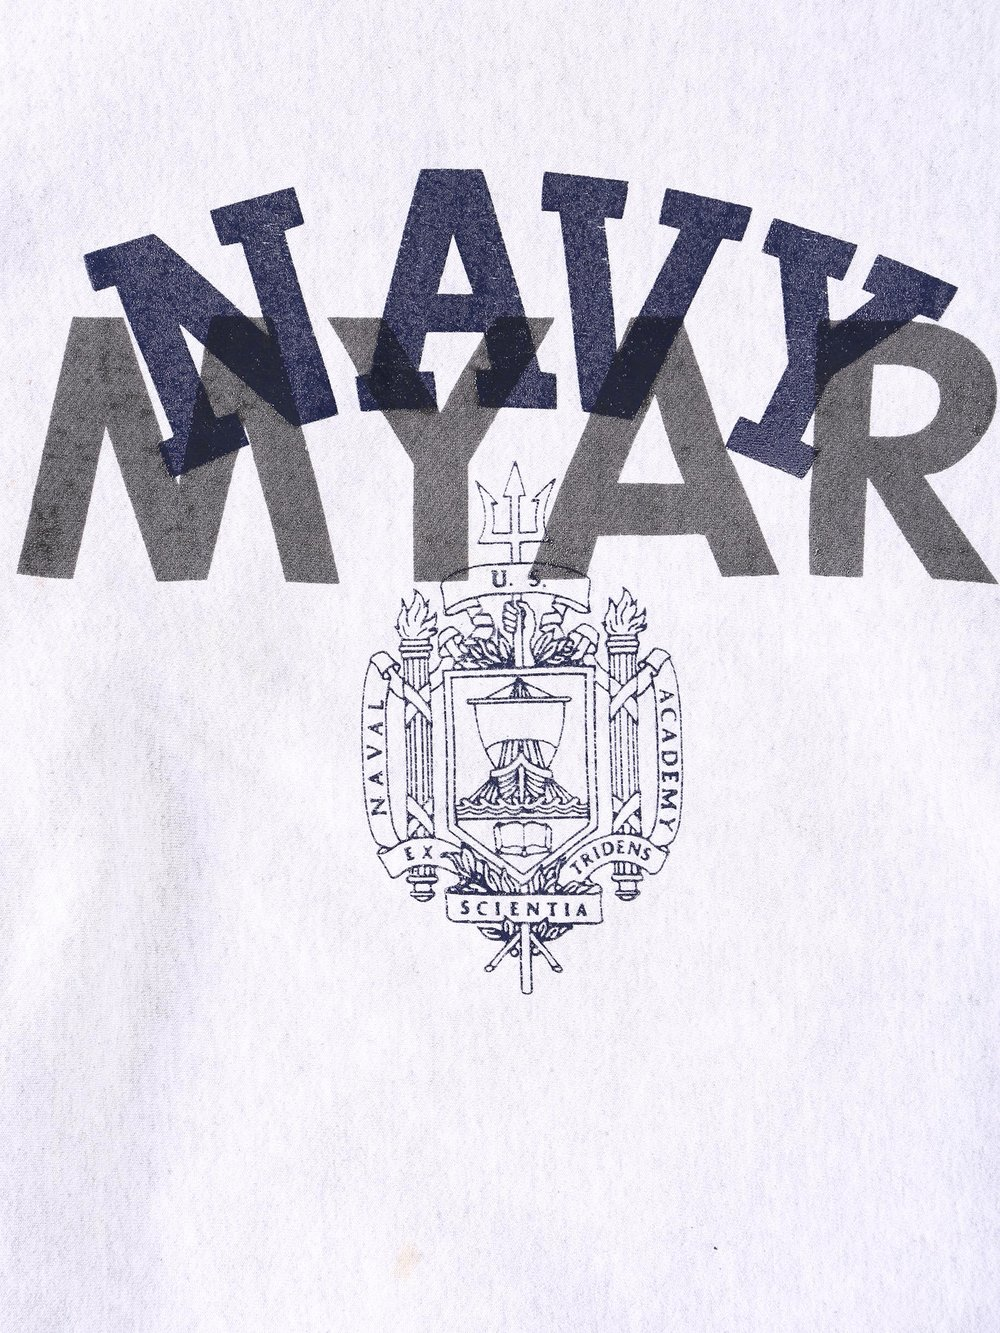 MYAR_usw91 (1).JPG